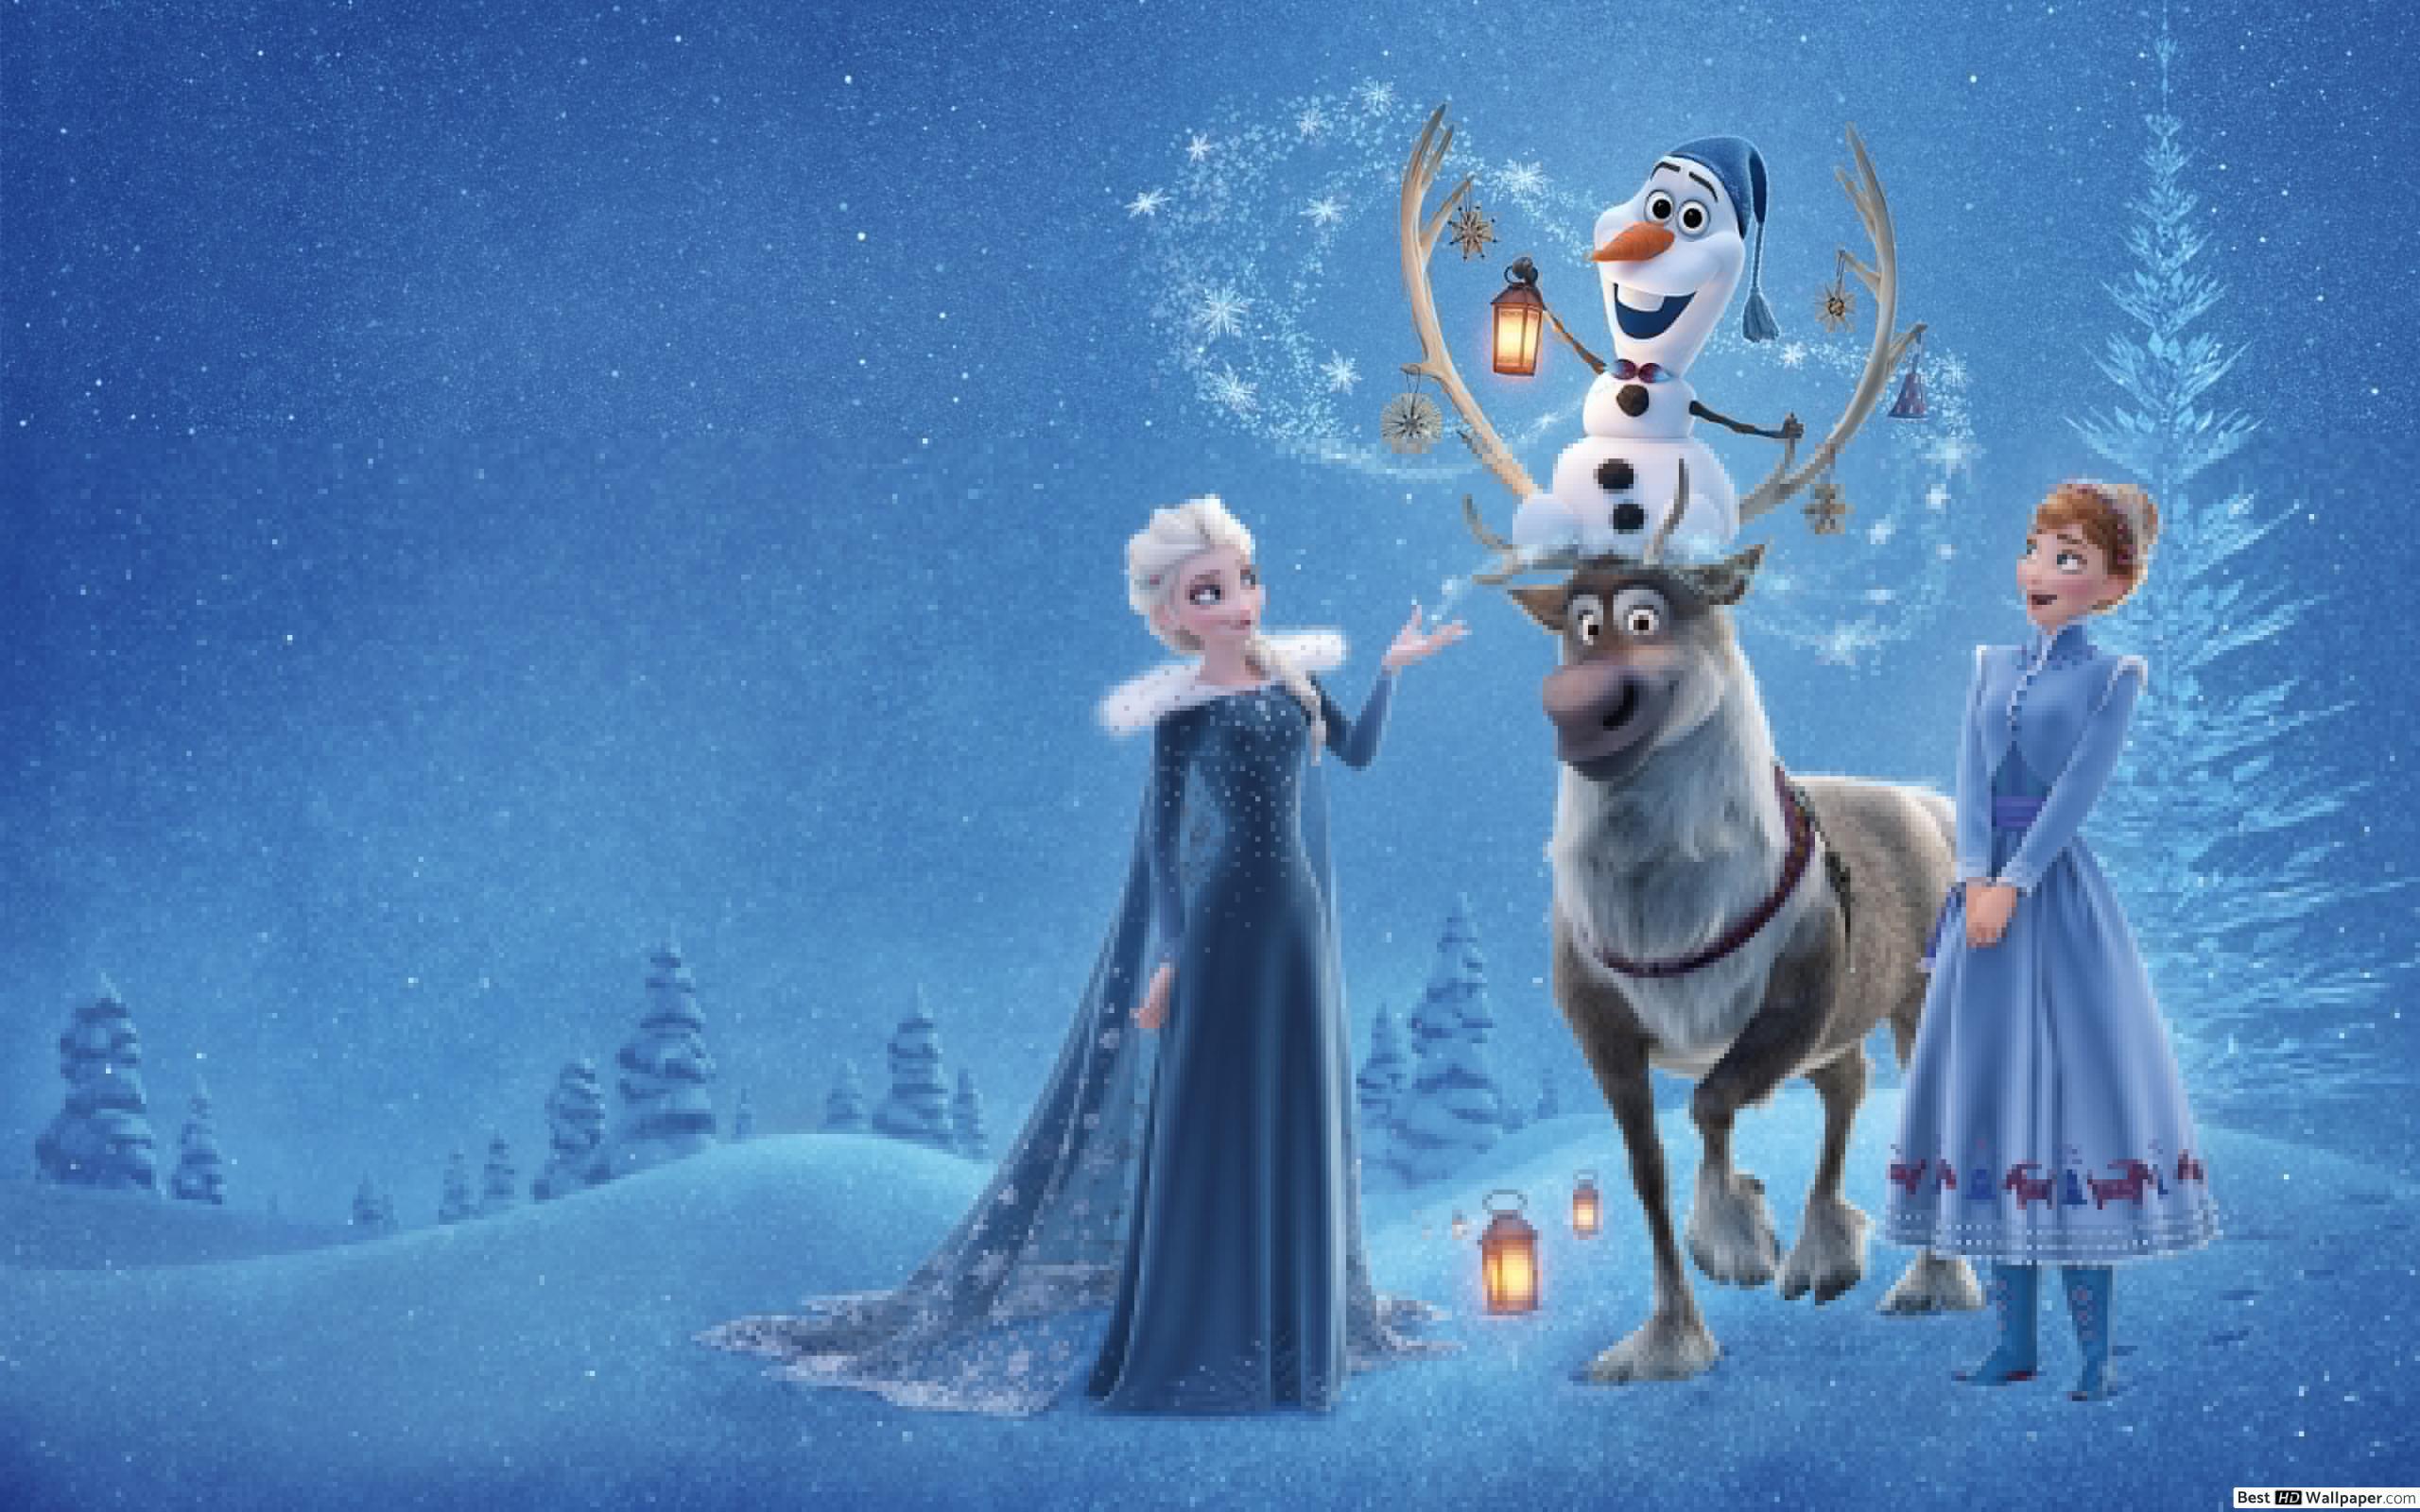 Frozen 2 Wallpapers Top Free Frozen 2 Backgrounds Wallpaperaccess